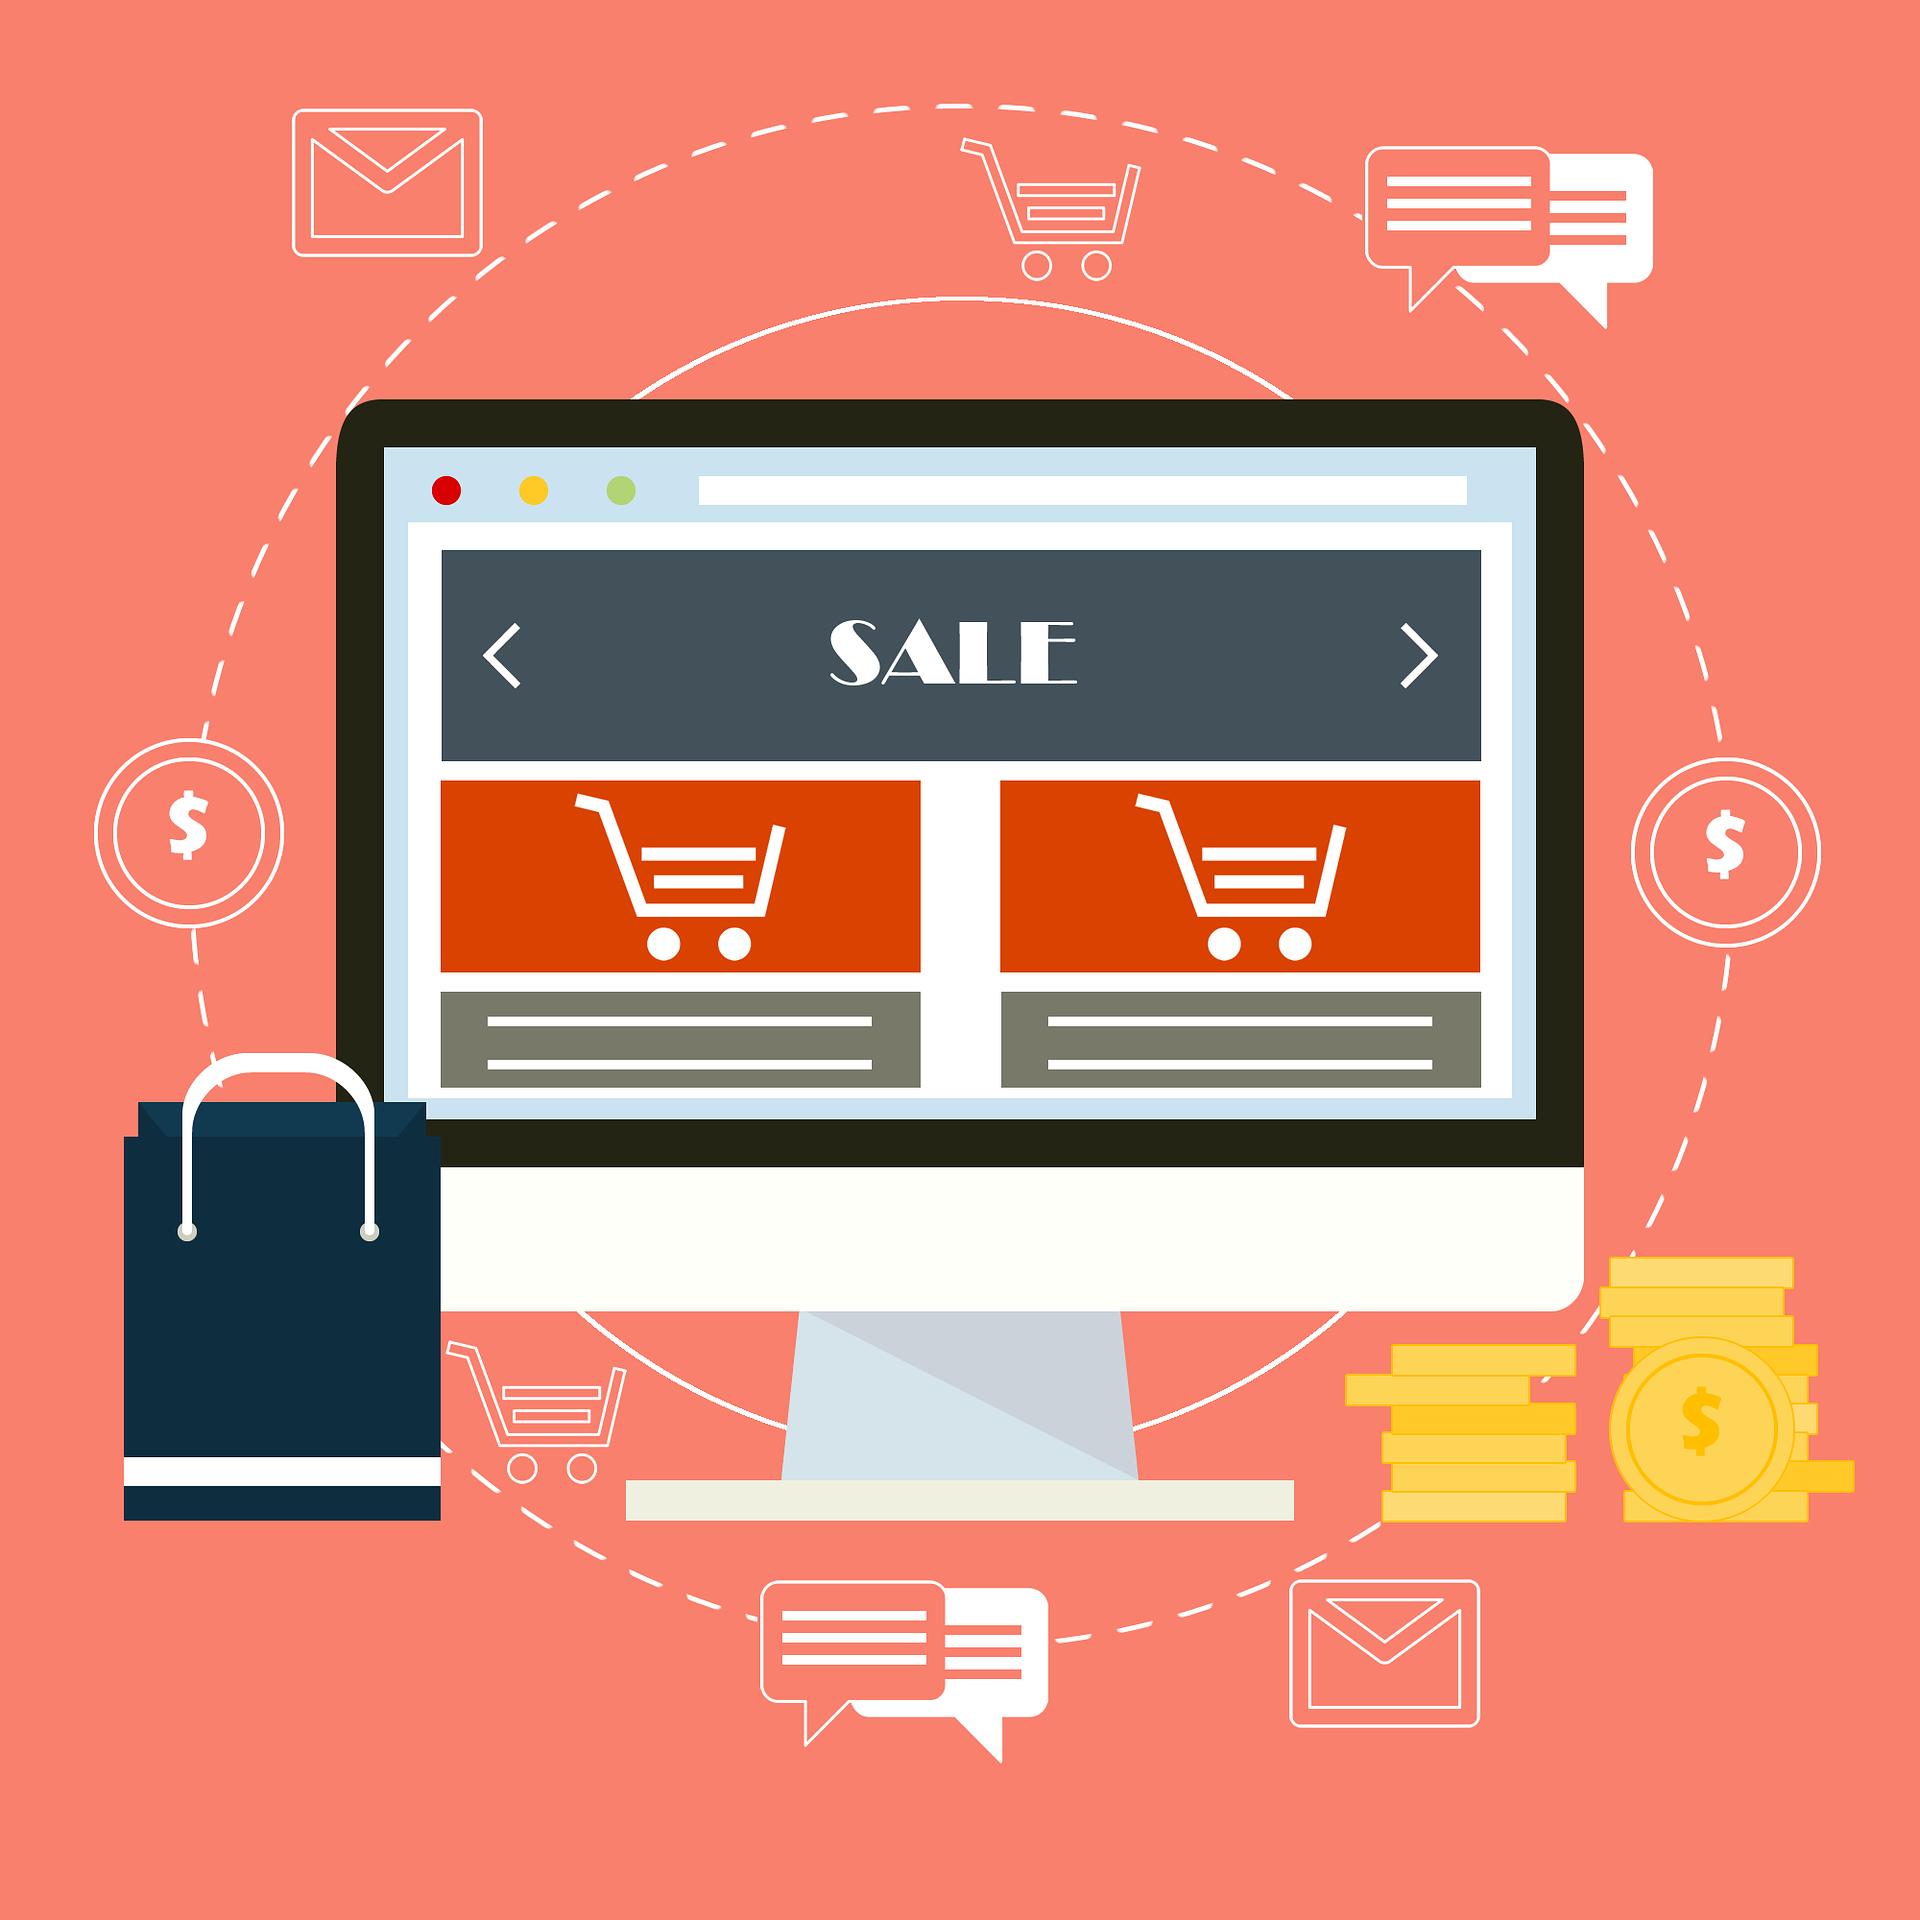 webfocus-online-shop